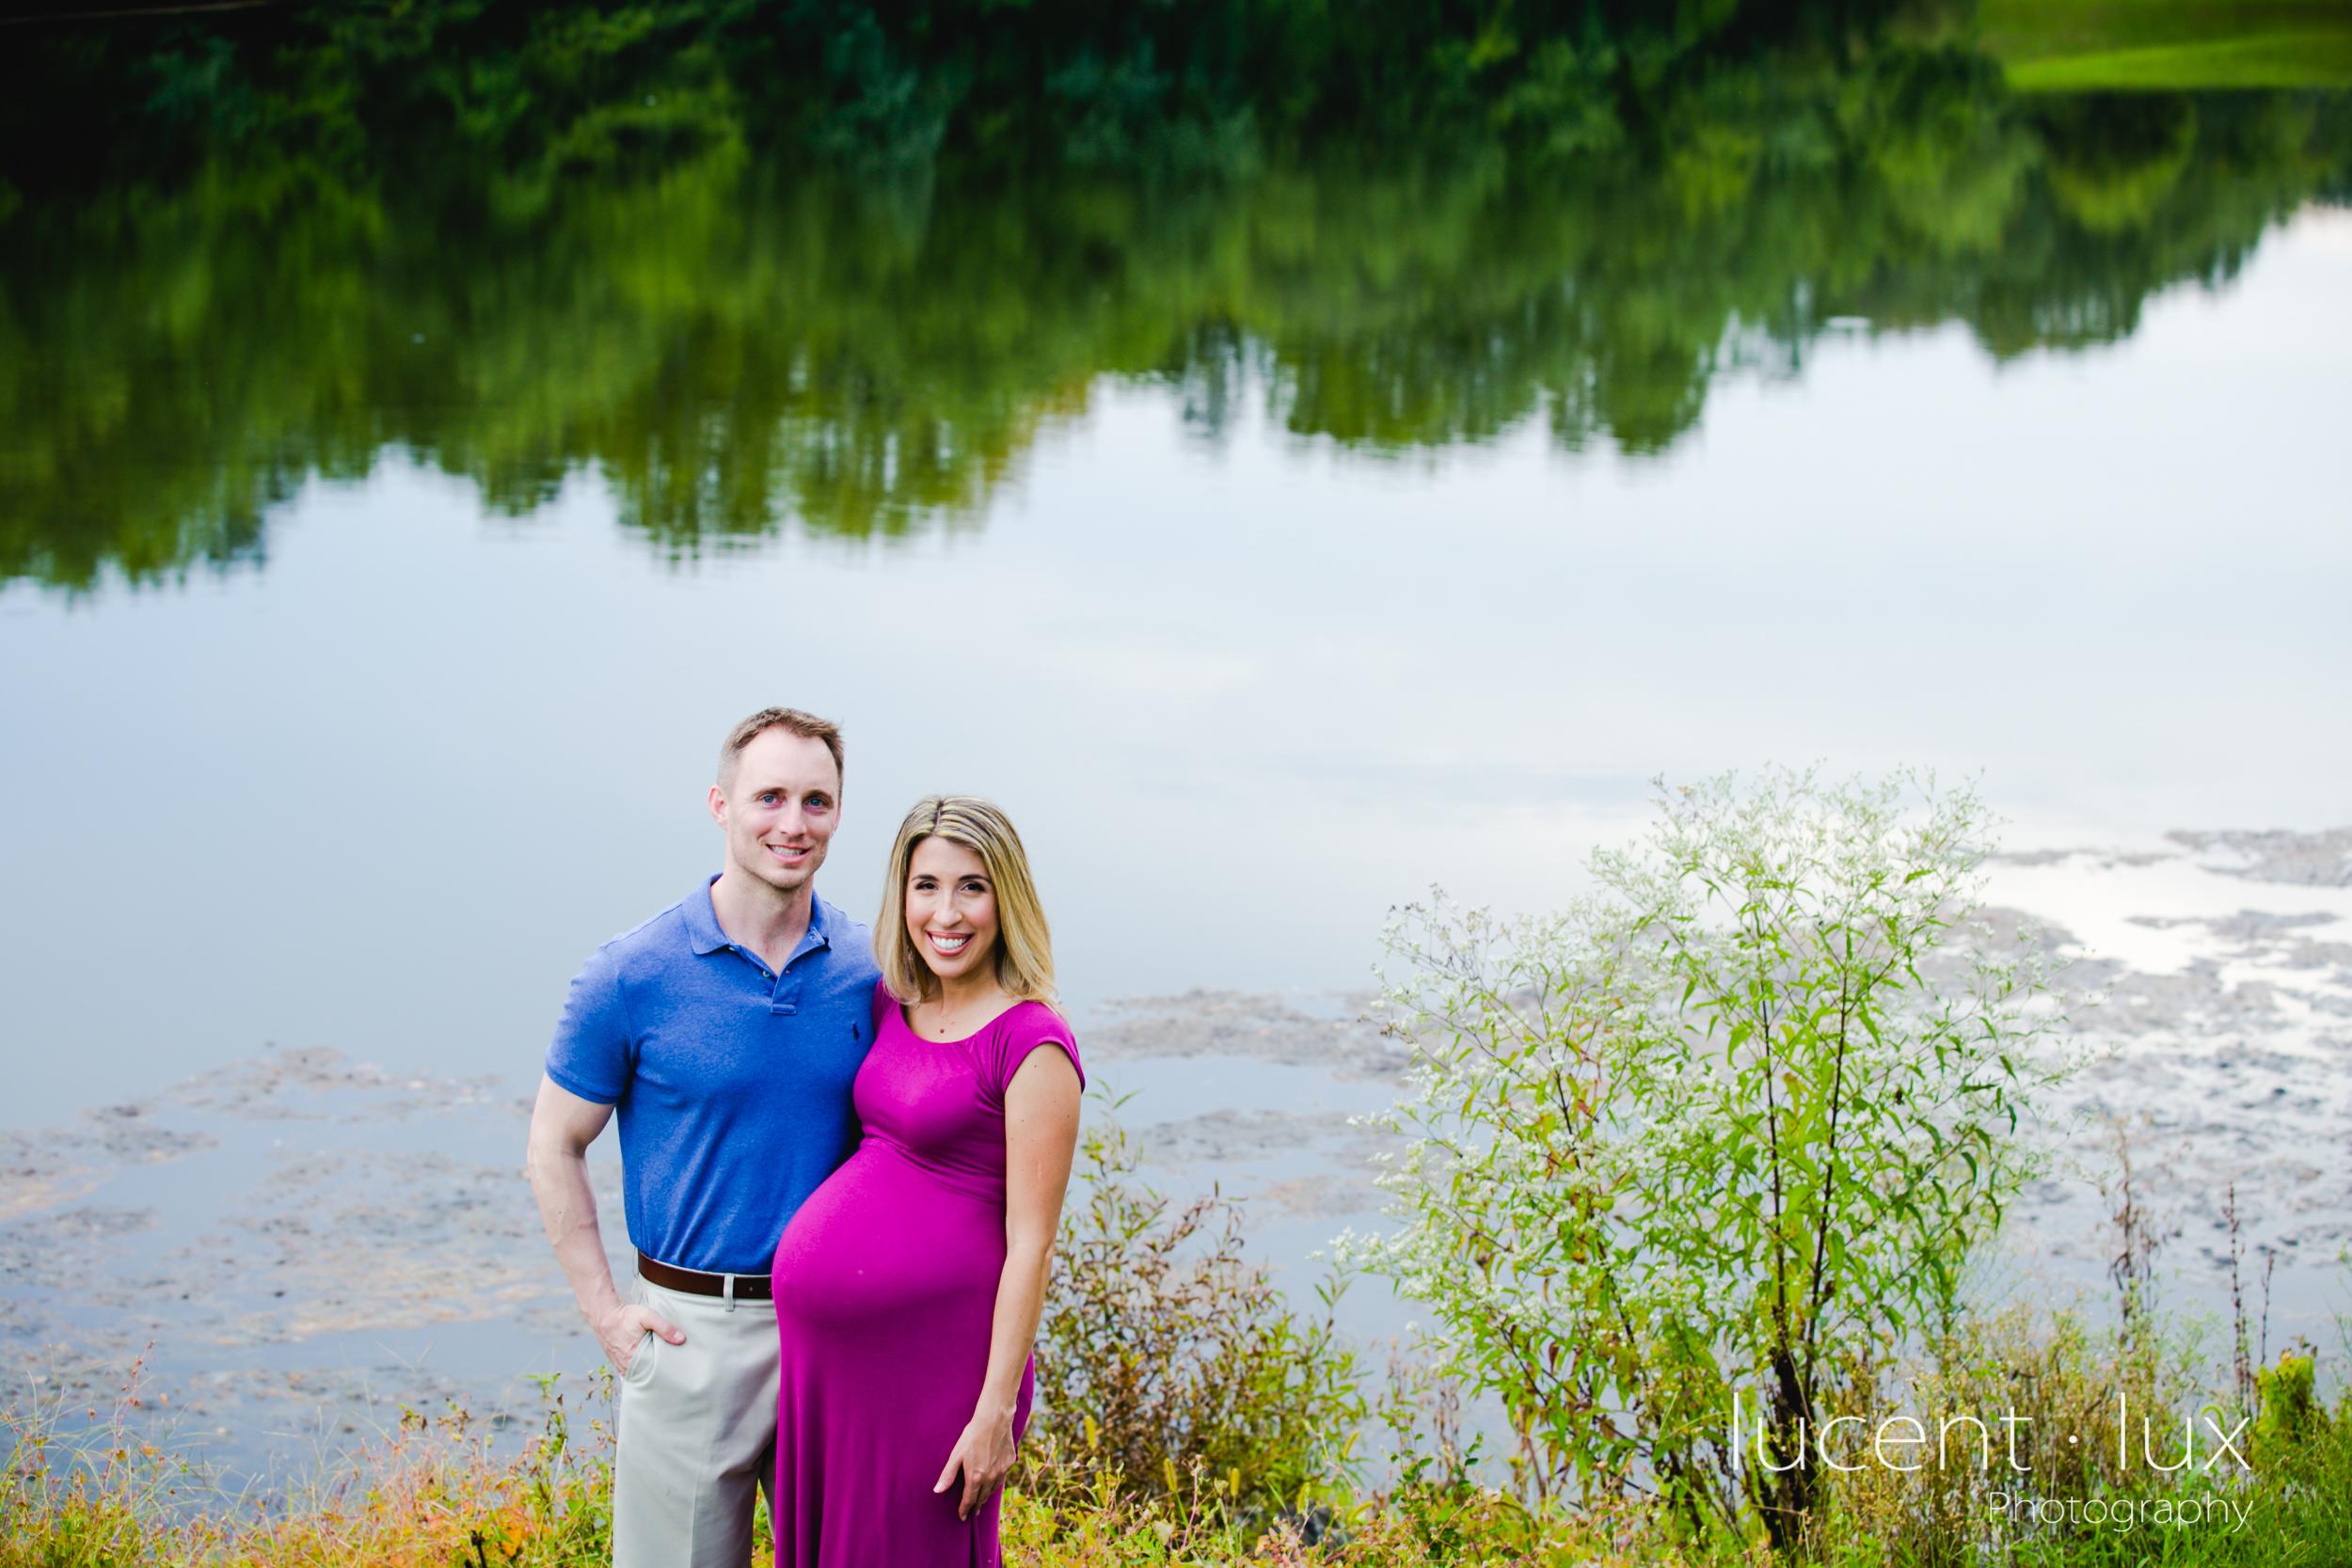 Maternity-Photography-Maryland-Baltimore-Photographer-Family-Portraits-Couple-Engagement-Newborn-204.jpg